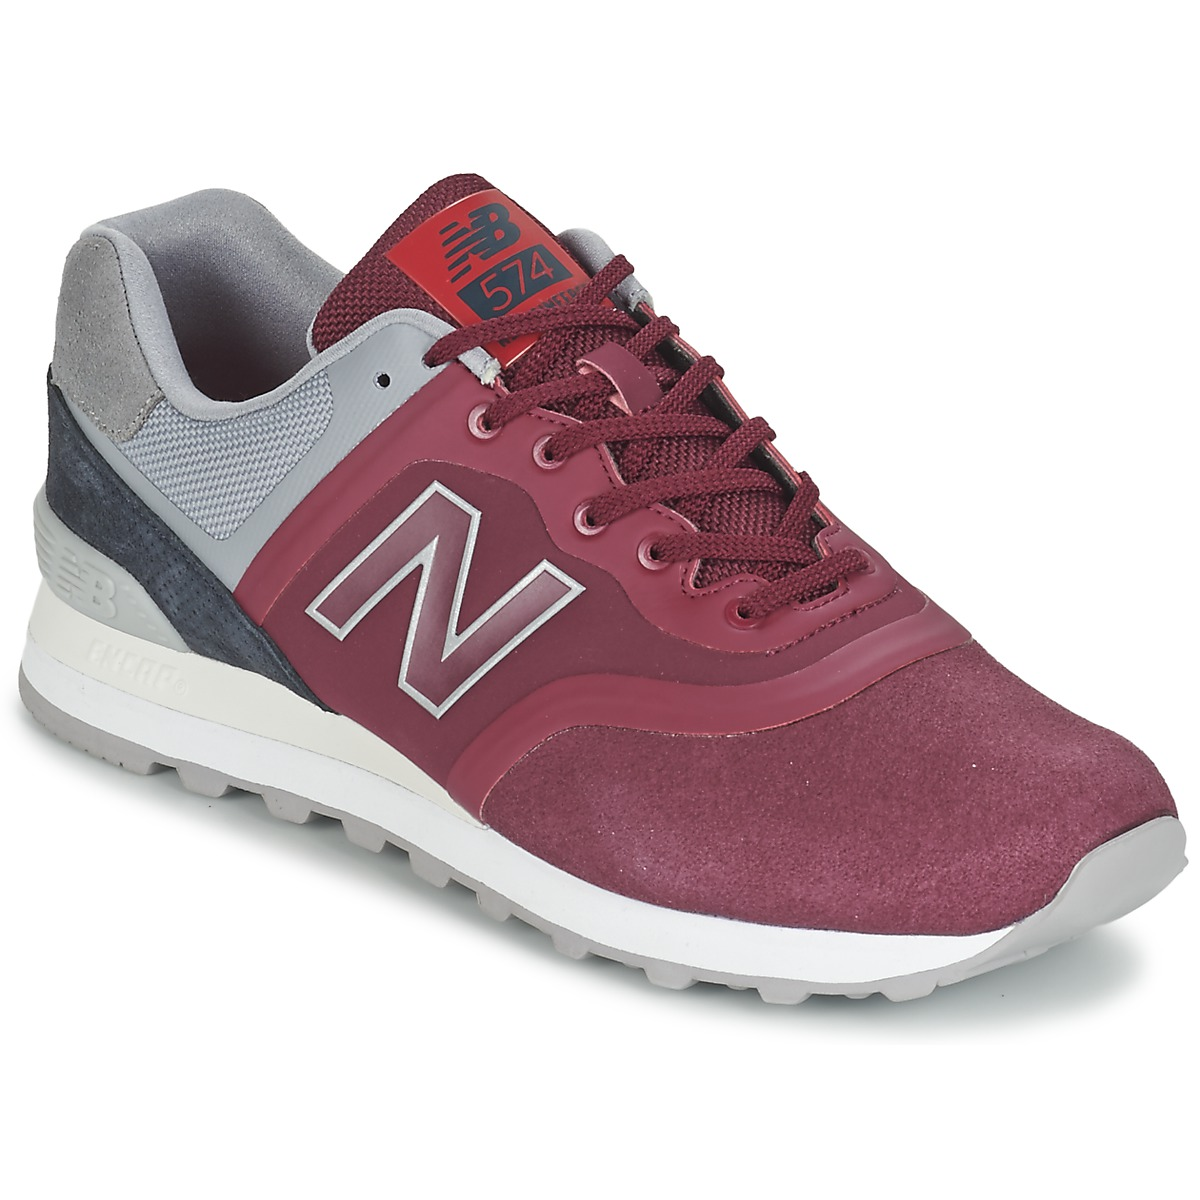 New Balance MTL574 Rouge / Gris